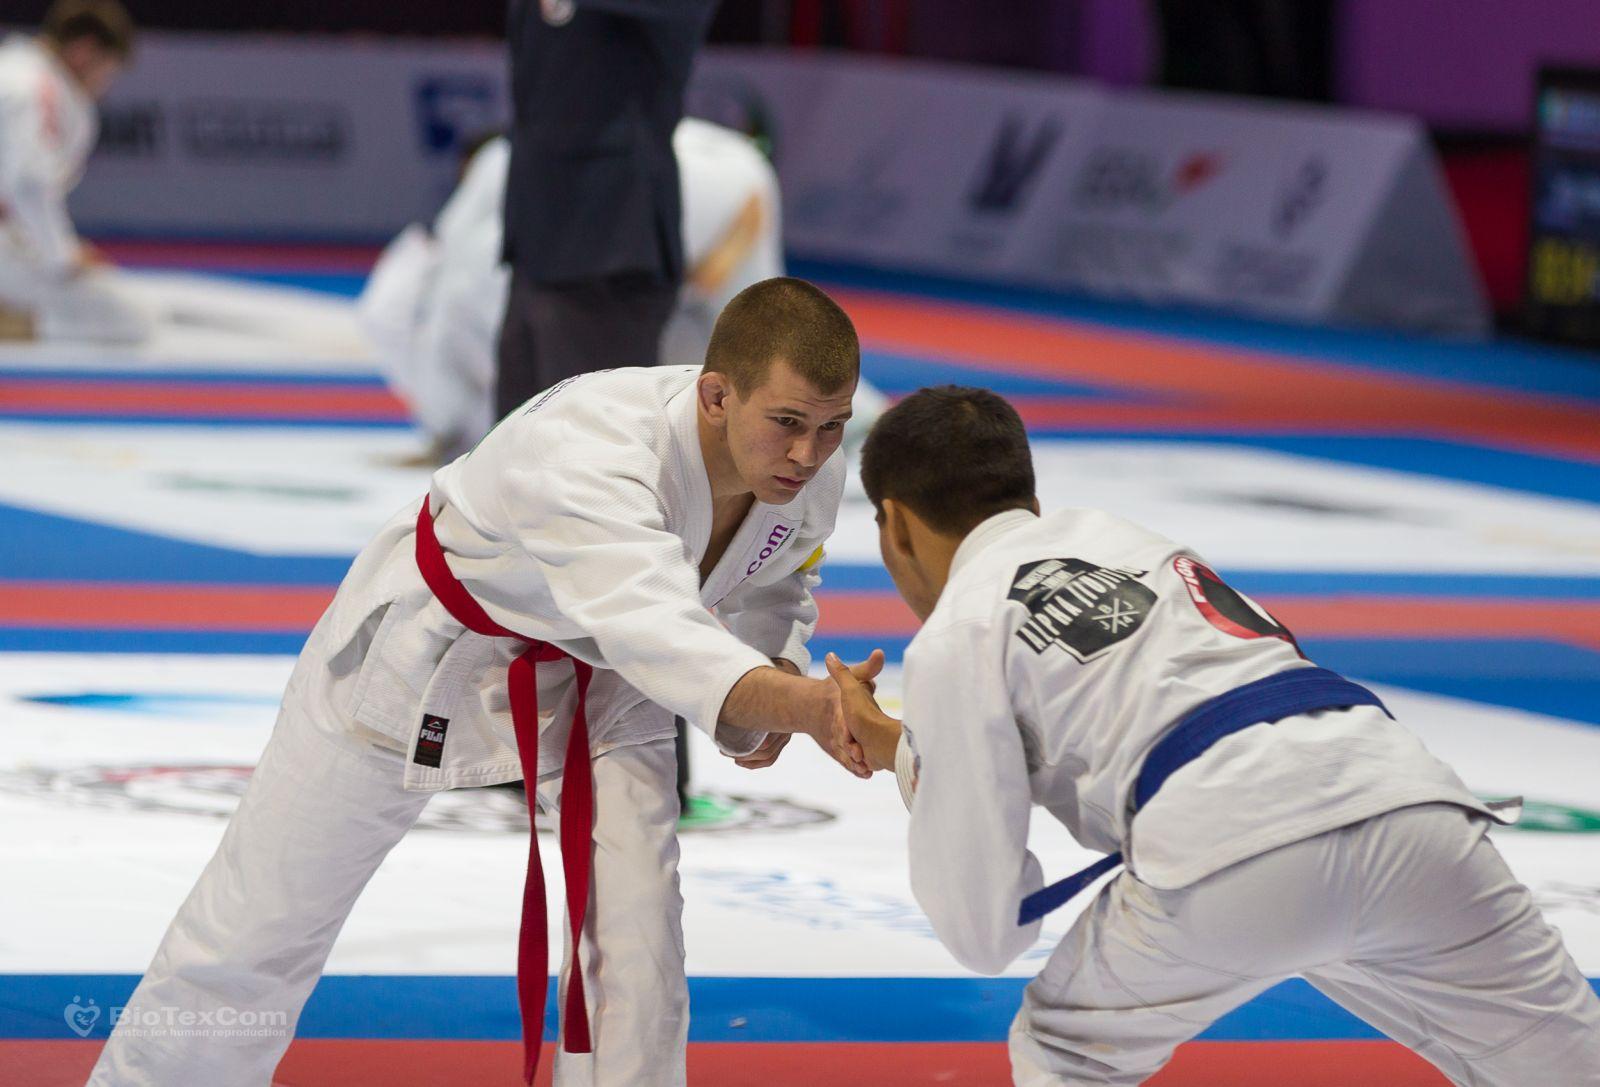 blazhko-yaroslav_Abu-Dhabi-World-Championship-2017-2_17